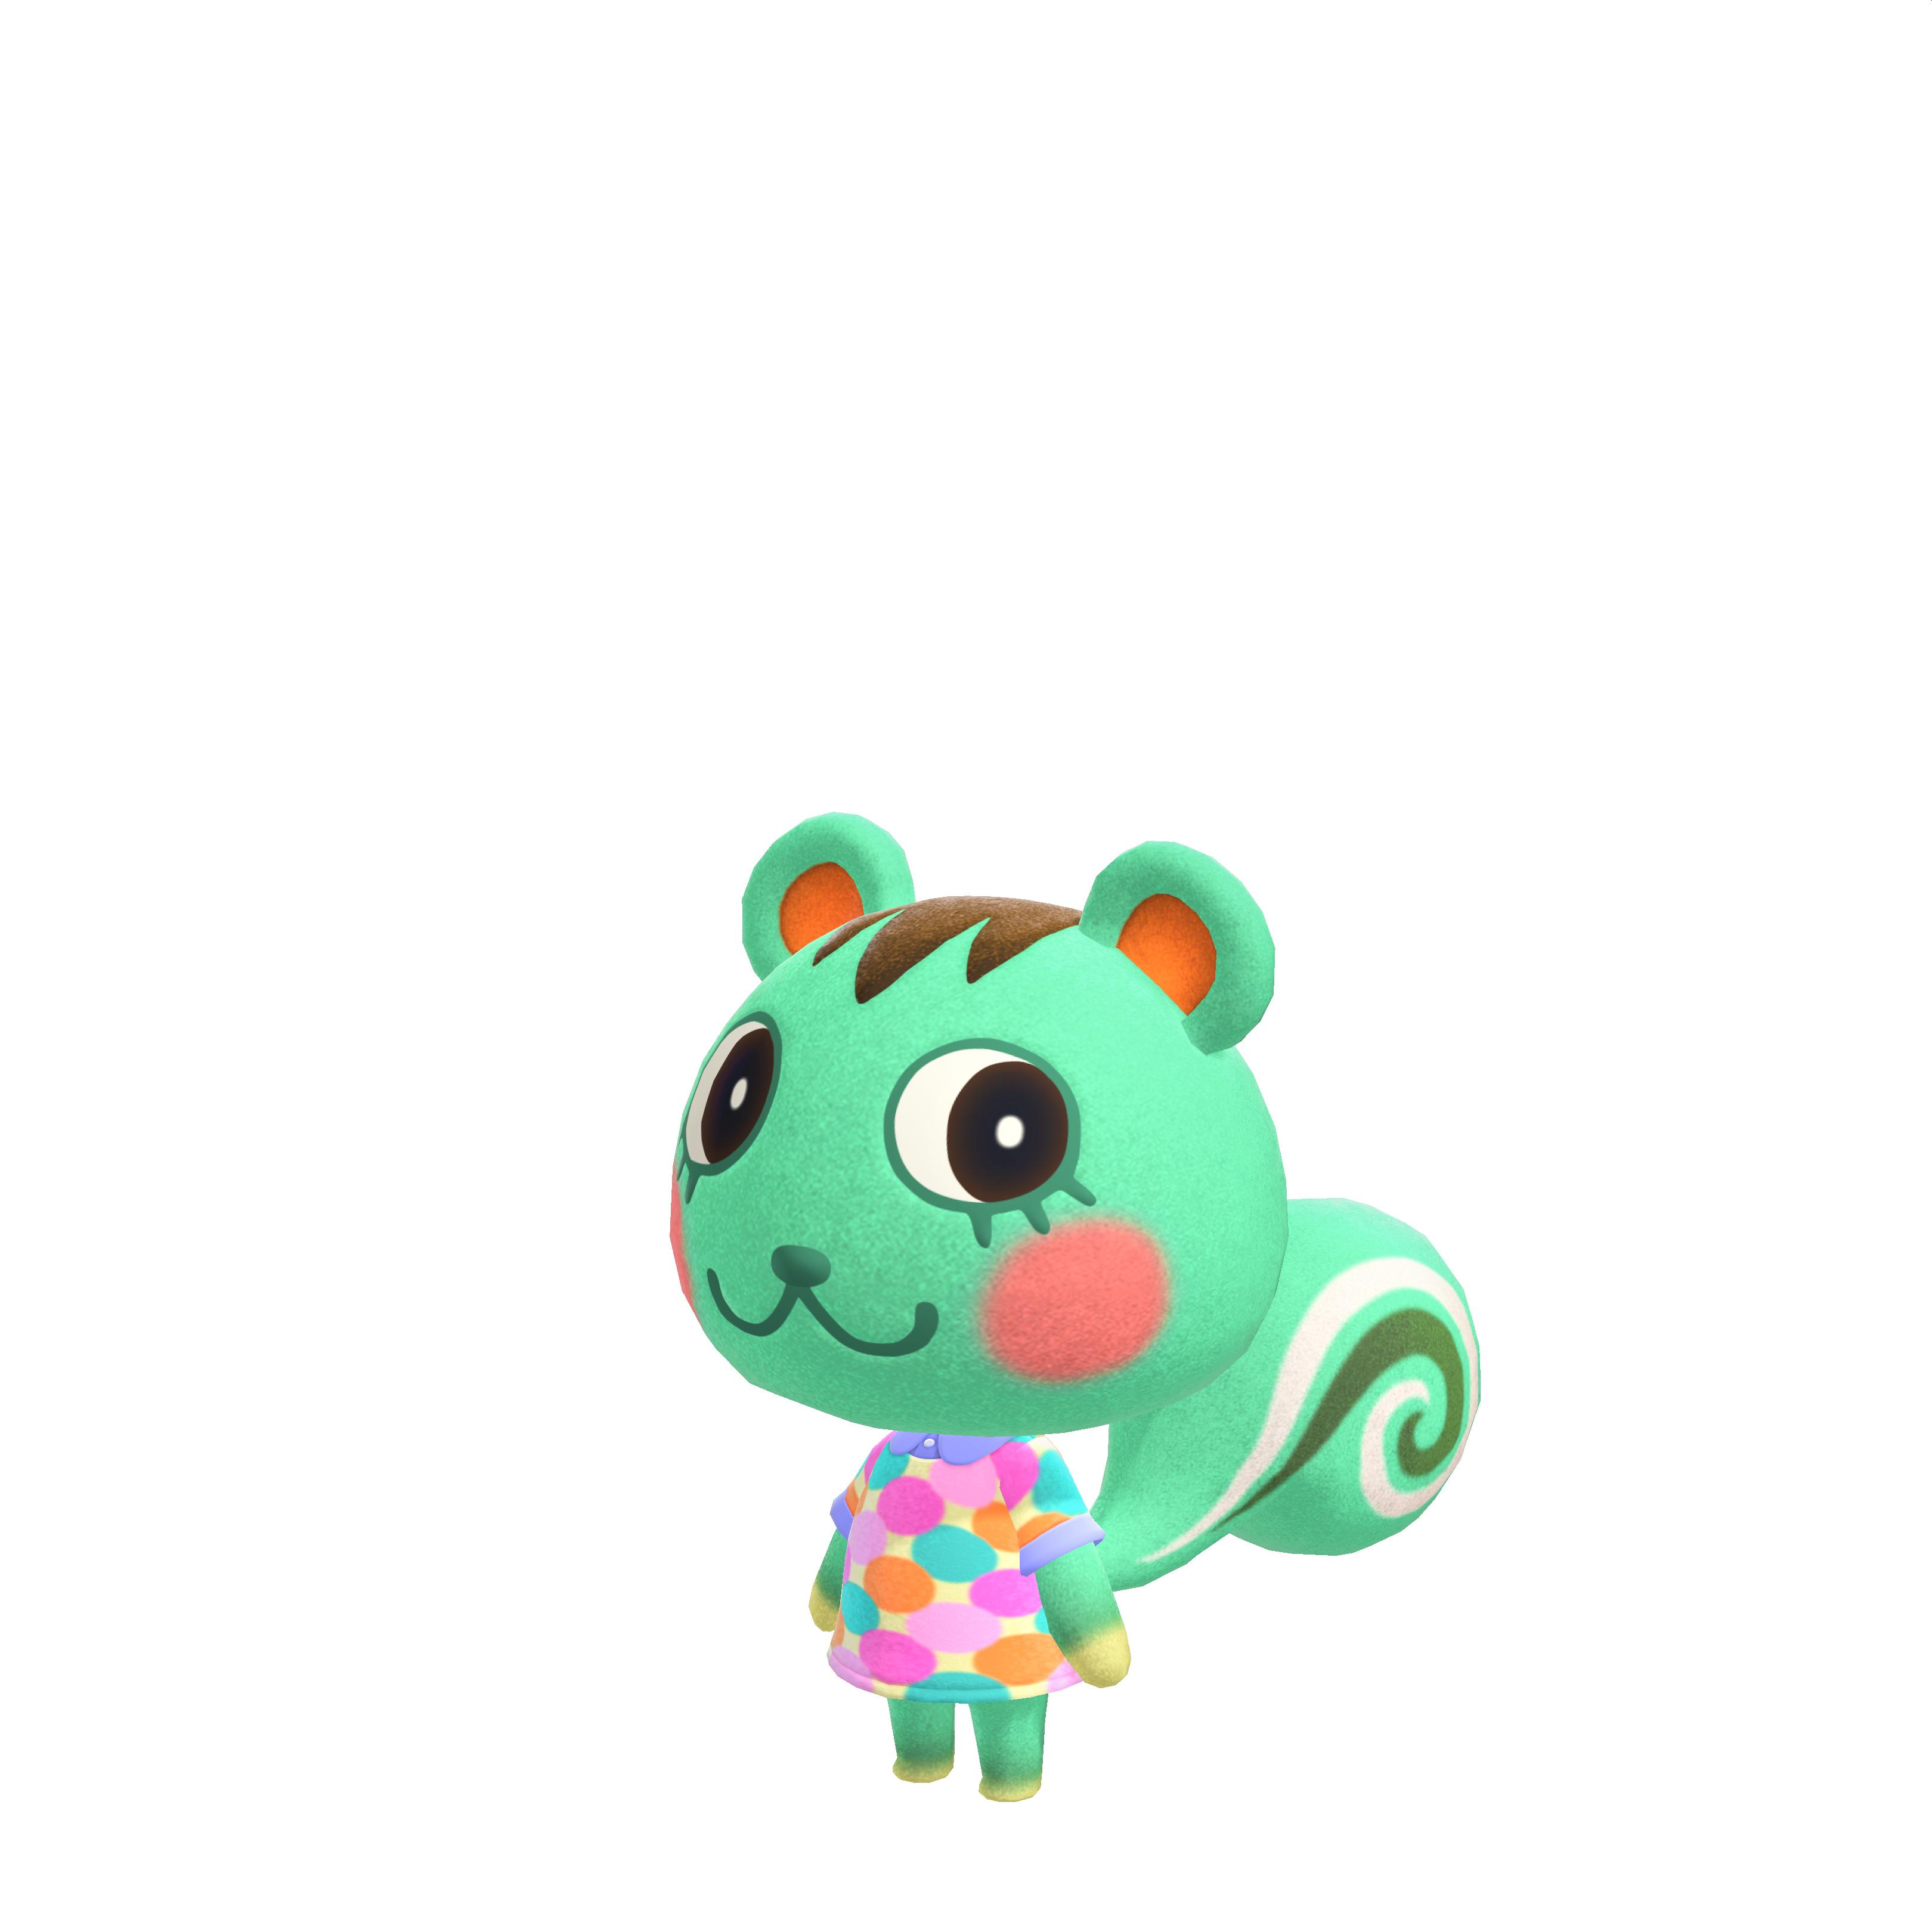 Wallpaper Animal Crossing New Horizons Android di 2020